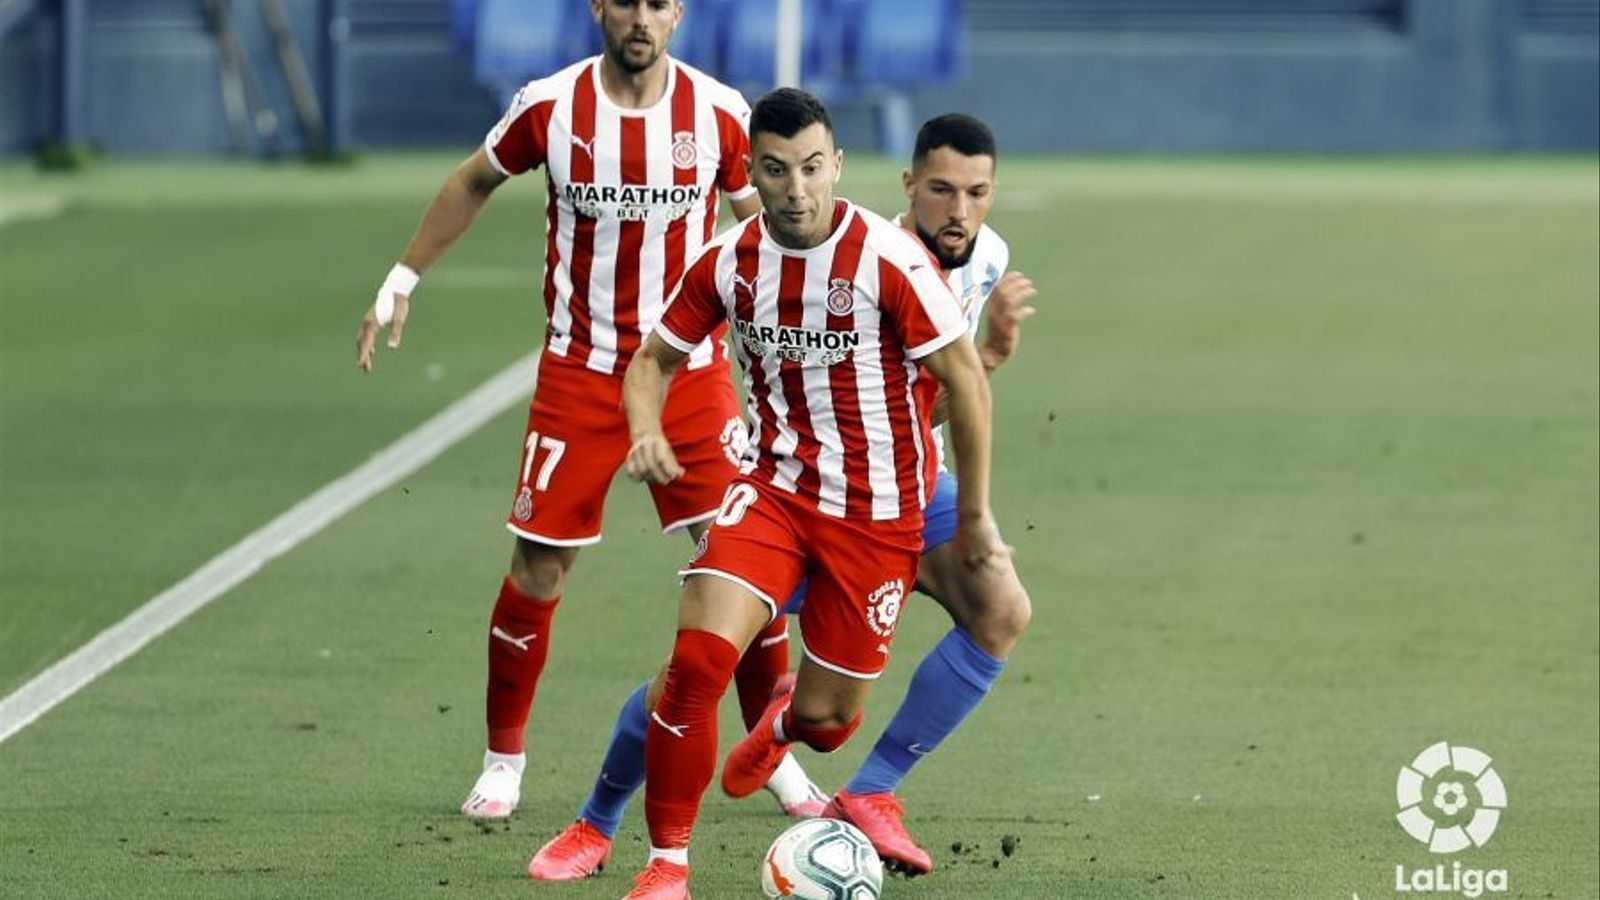 El Girona s'elimina injustificadament (2-0)